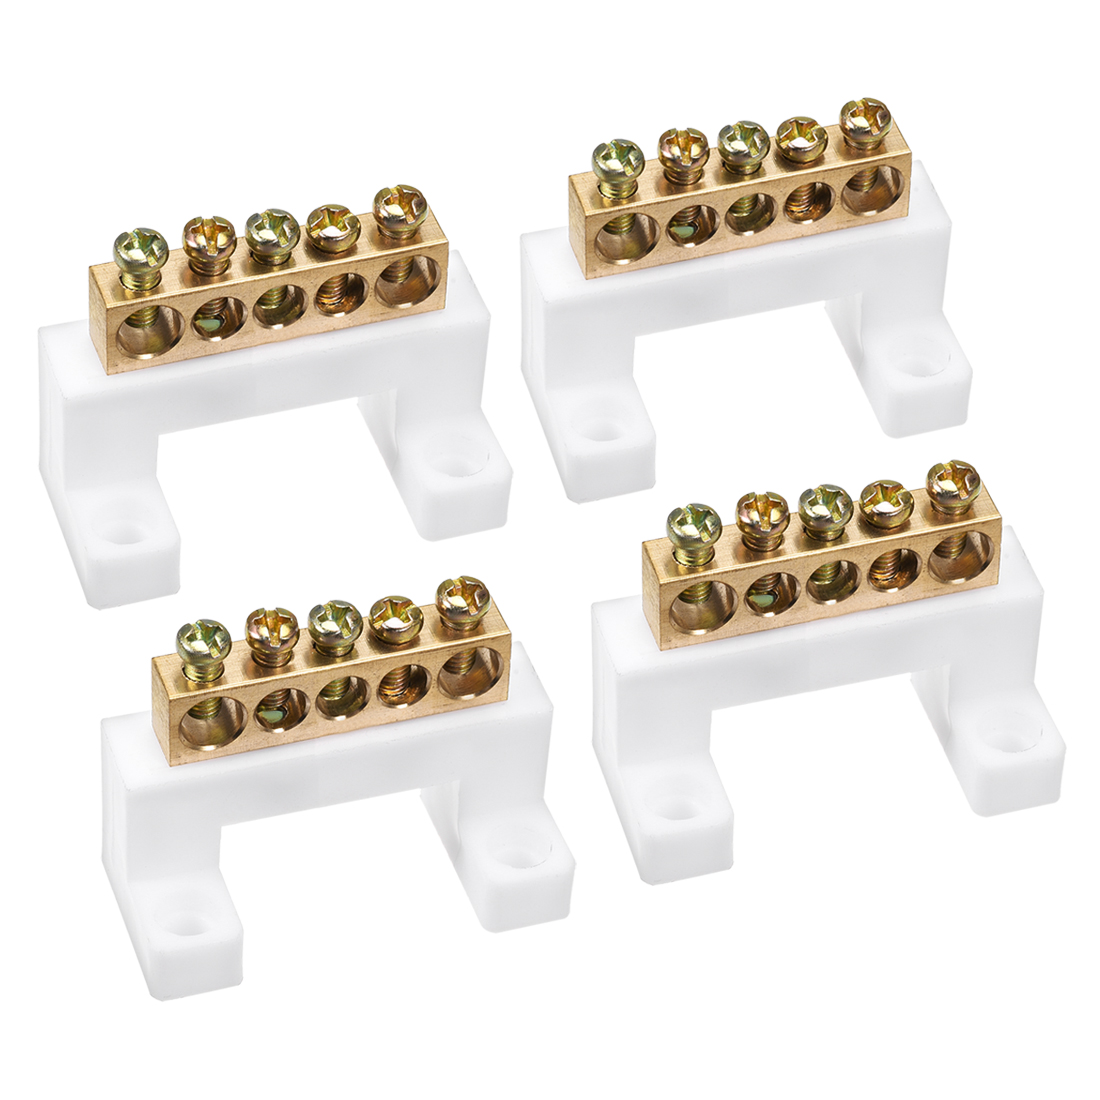 Copper Screw Terminal Block Bar 100A Double Row Bridge Shape 5 Positions 4 Pcs